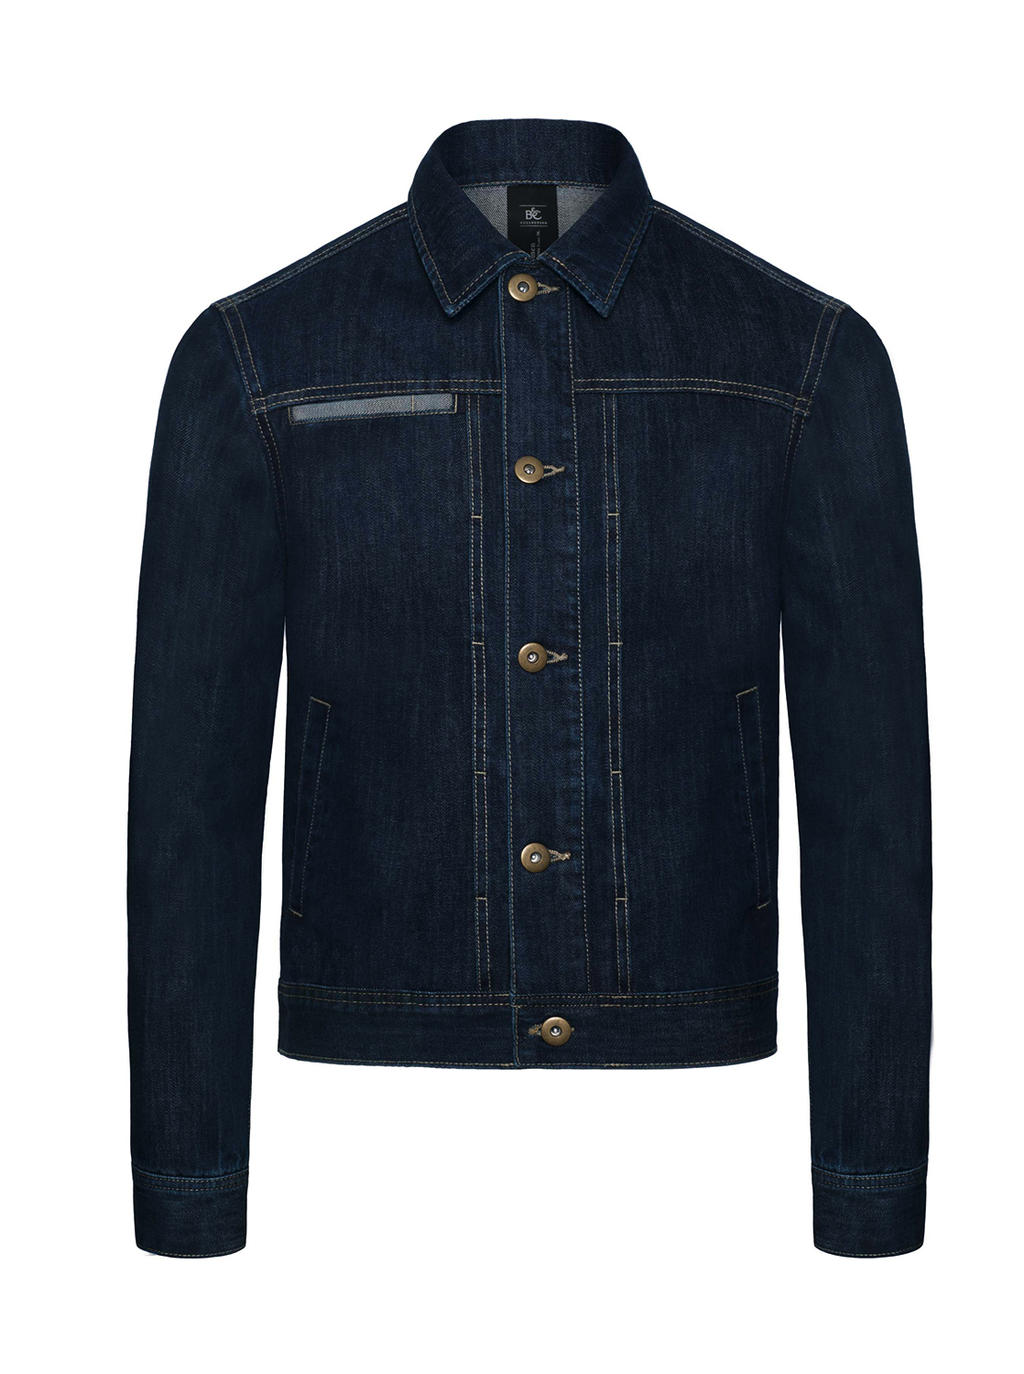 b c herren jeans jacke trucker jacket denim frame jeansjacke s 3xl neu ebay. Black Bedroom Furniture Sets. Home Design Ideas